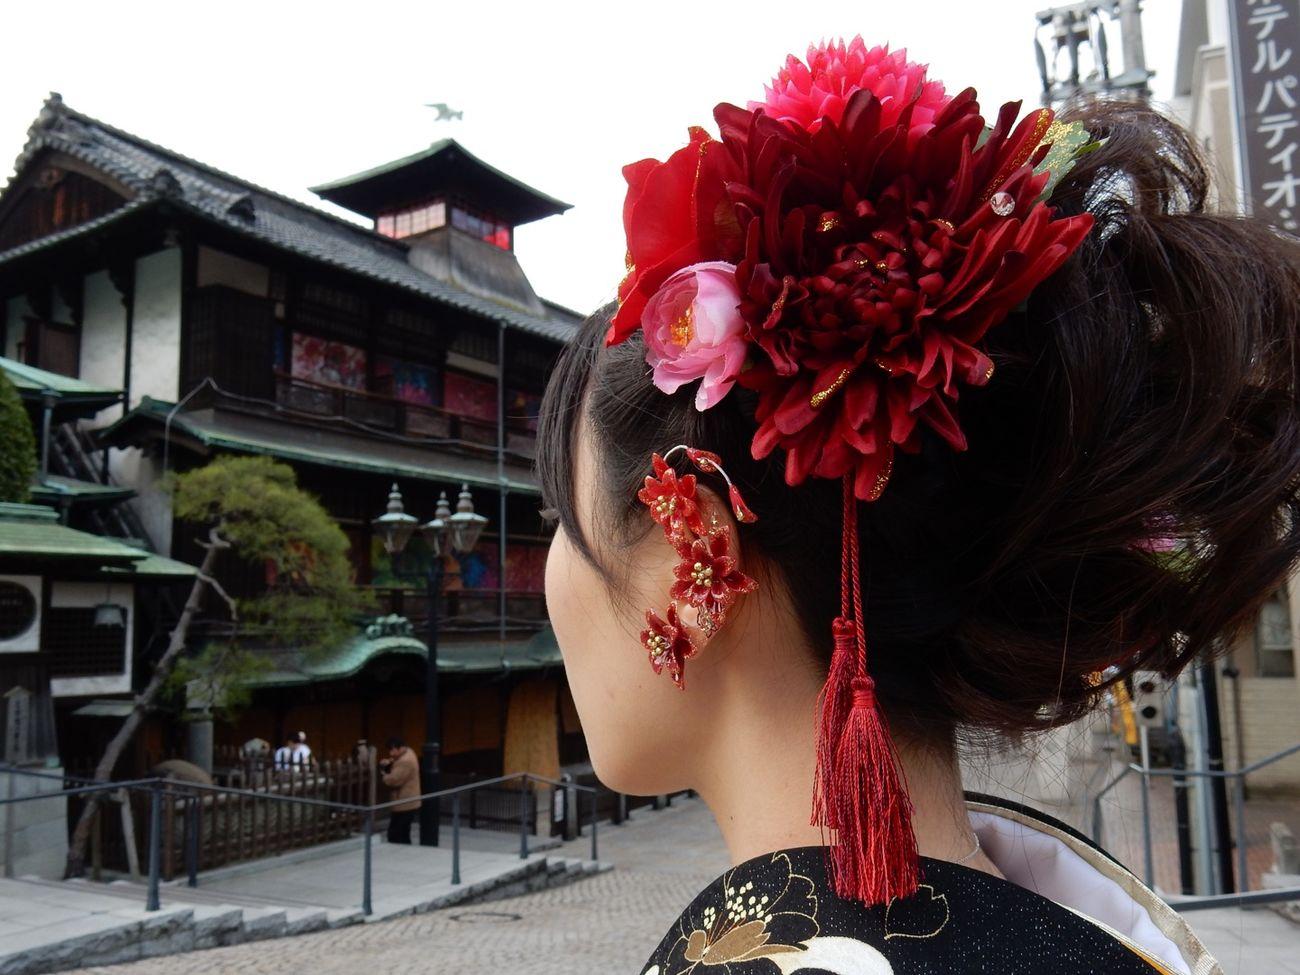 Dogo Onsen Hot Spring Coming-of-age Ceremony Kimono KimonoStyle Ehime Japanese Style 姫様 成人式 蜷川実花プロデュース 道後アート イアーアート 道後温泉